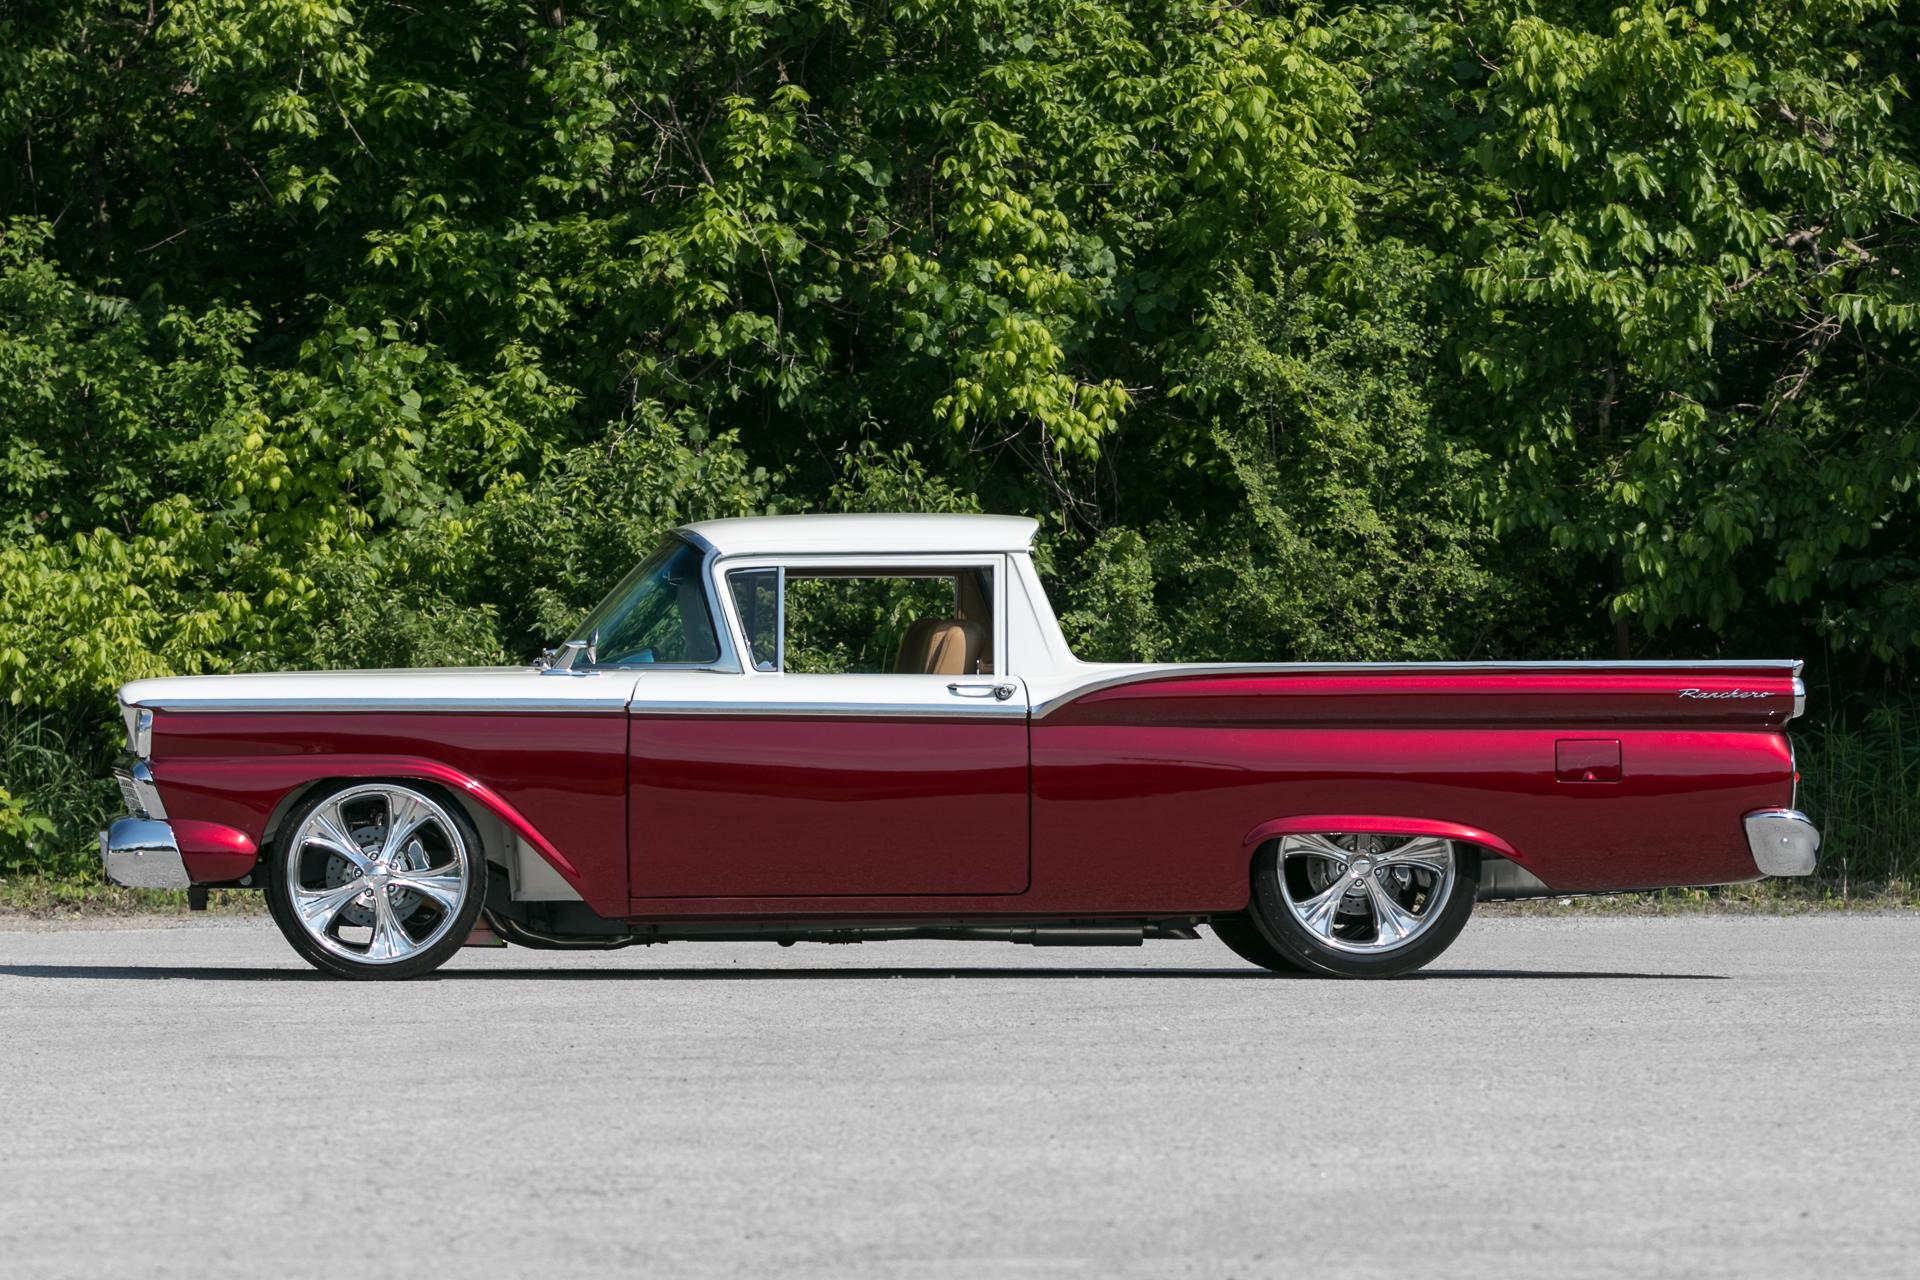 1959 Ford Ranchero | Fast Lane Classic Cars